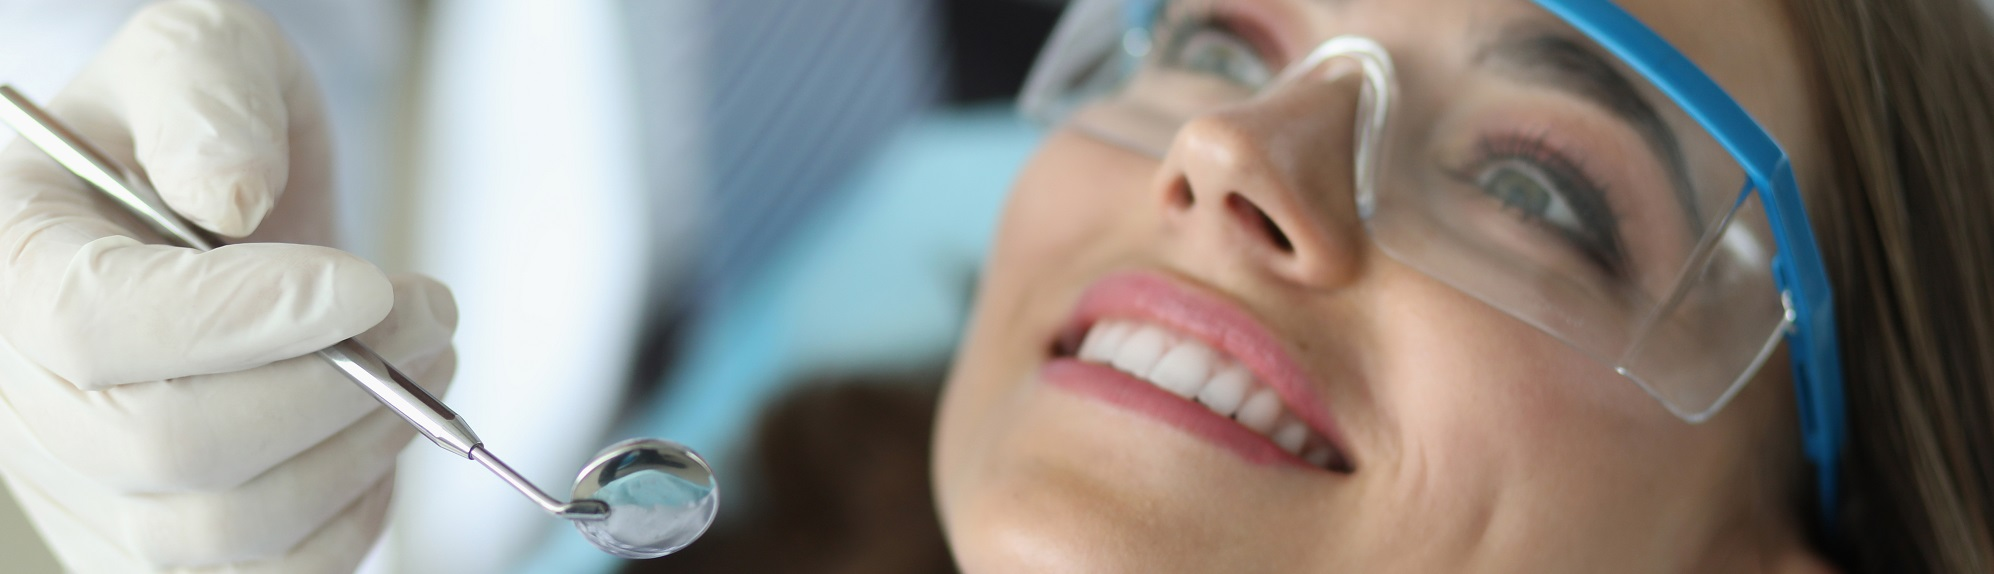 dentist-hold-hand-mirror-ready-examine-female-patient